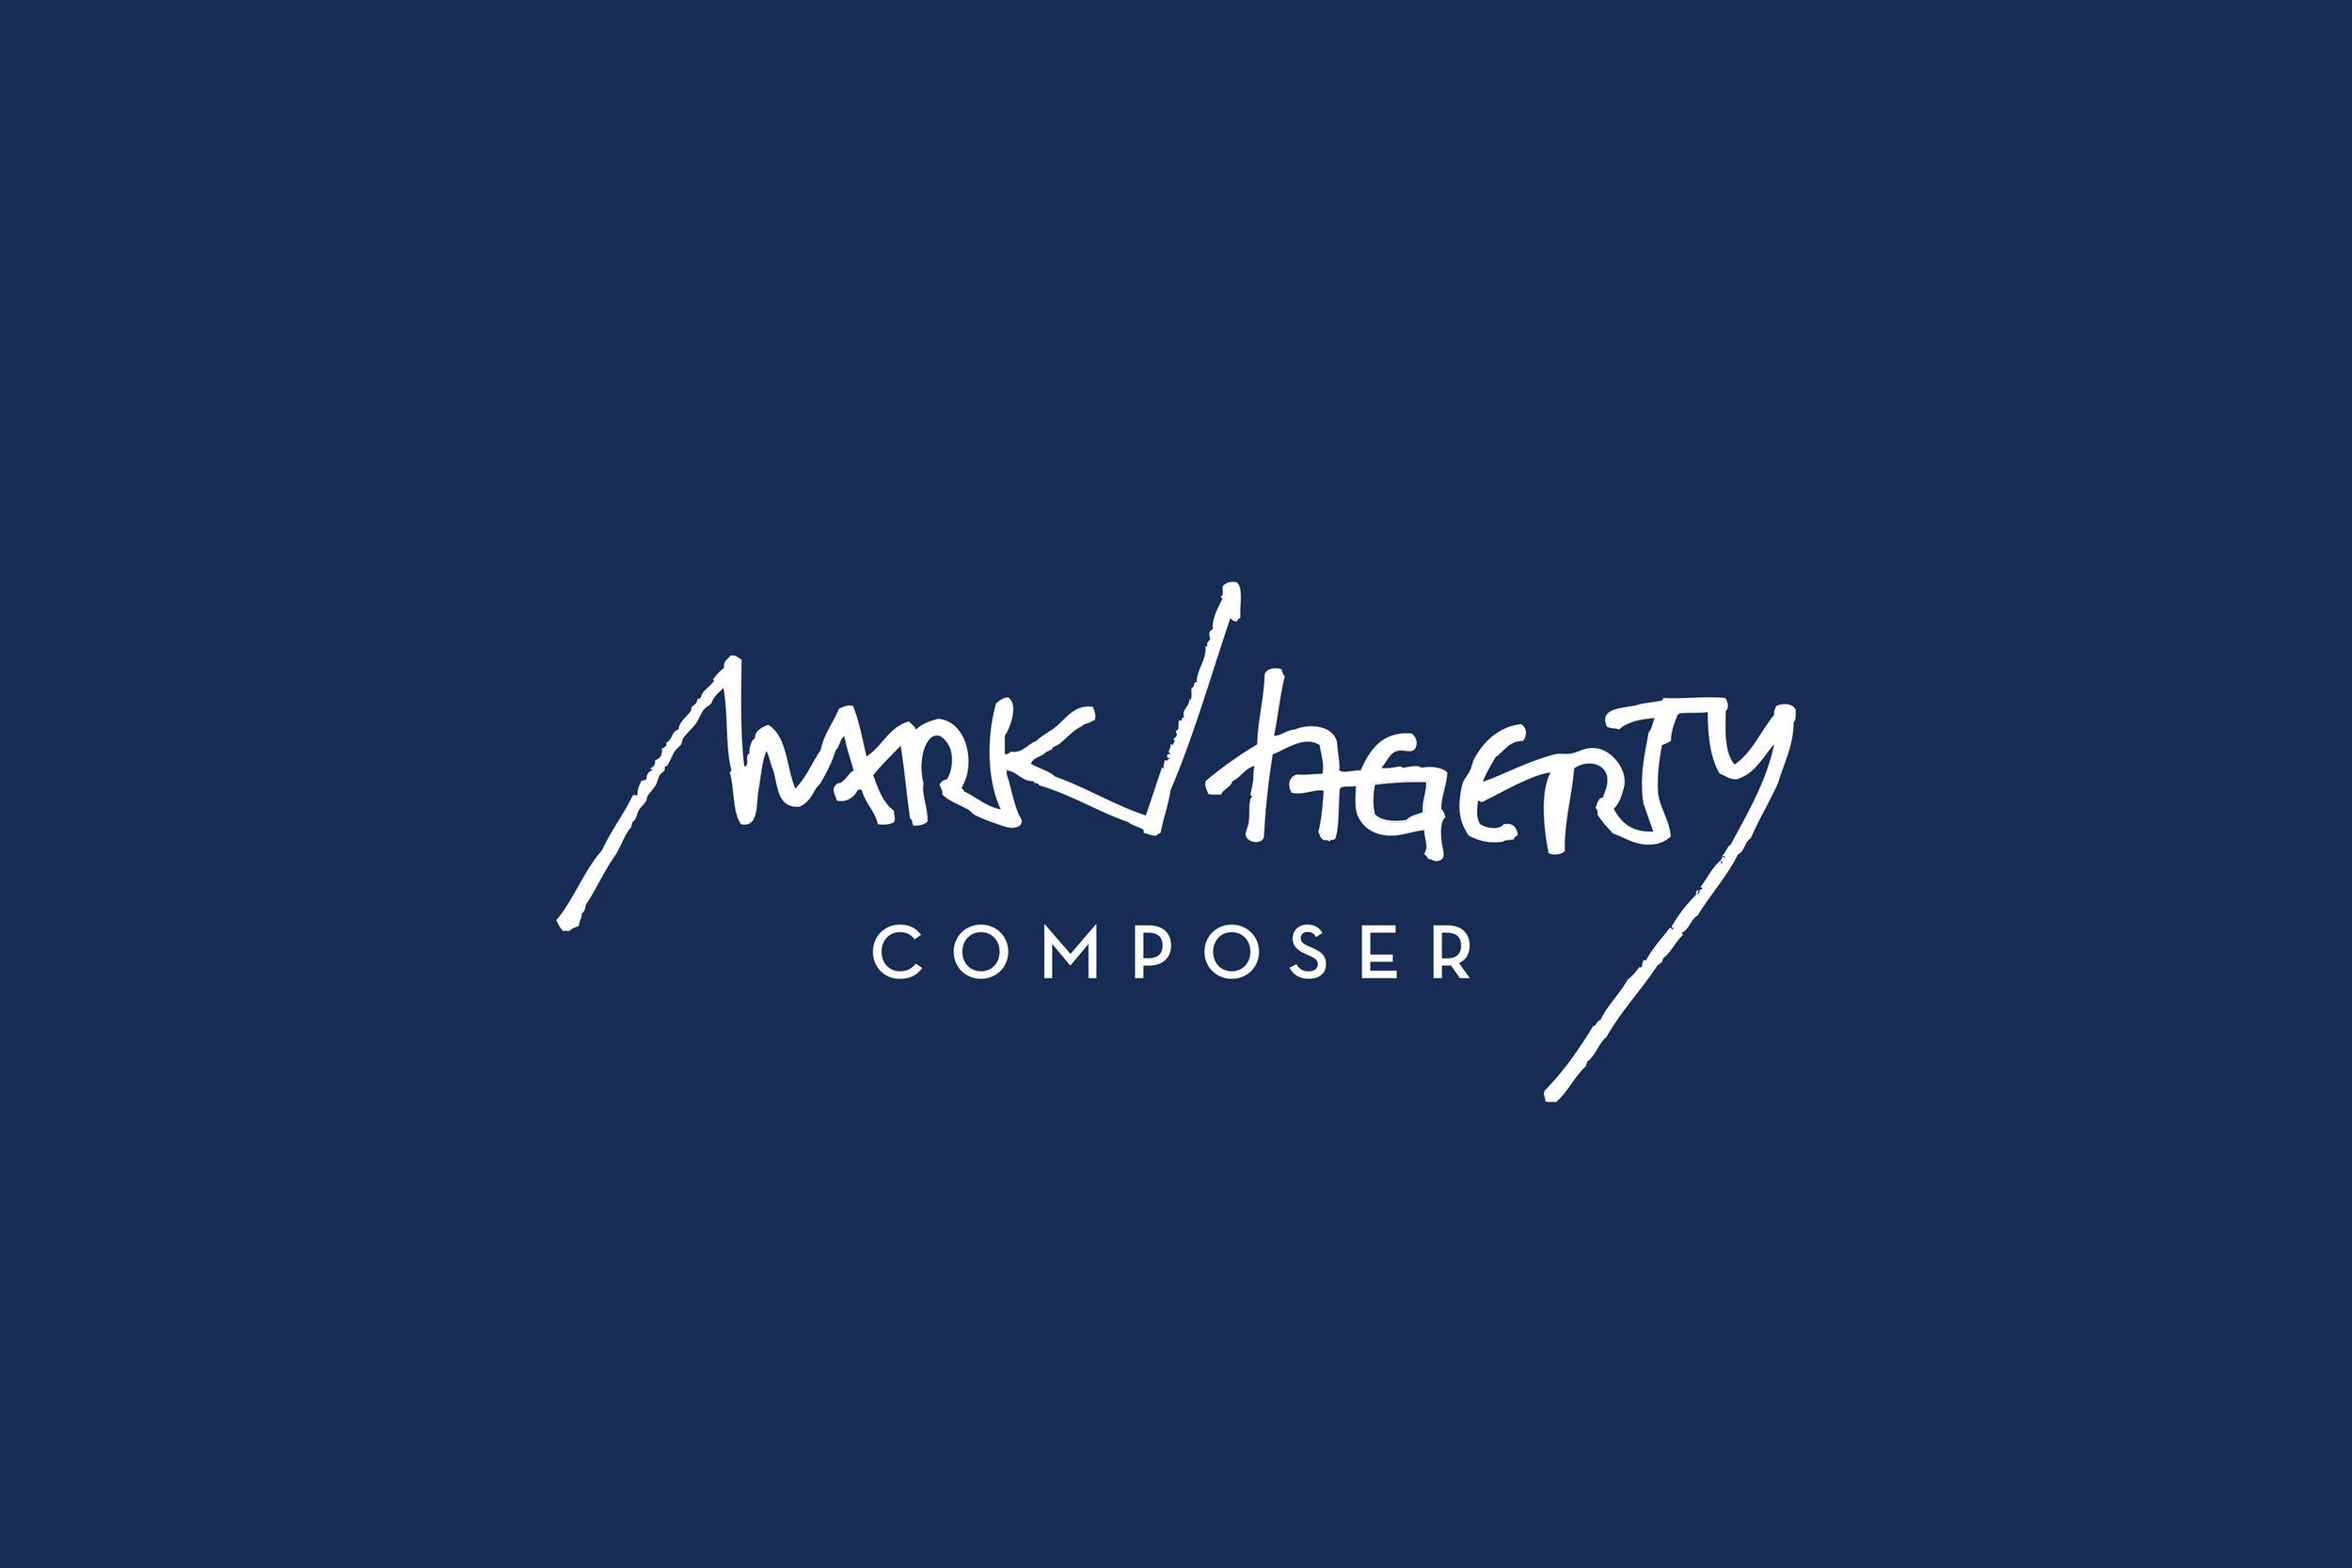 Hagerty-Brand-Intro-Blue.jpg